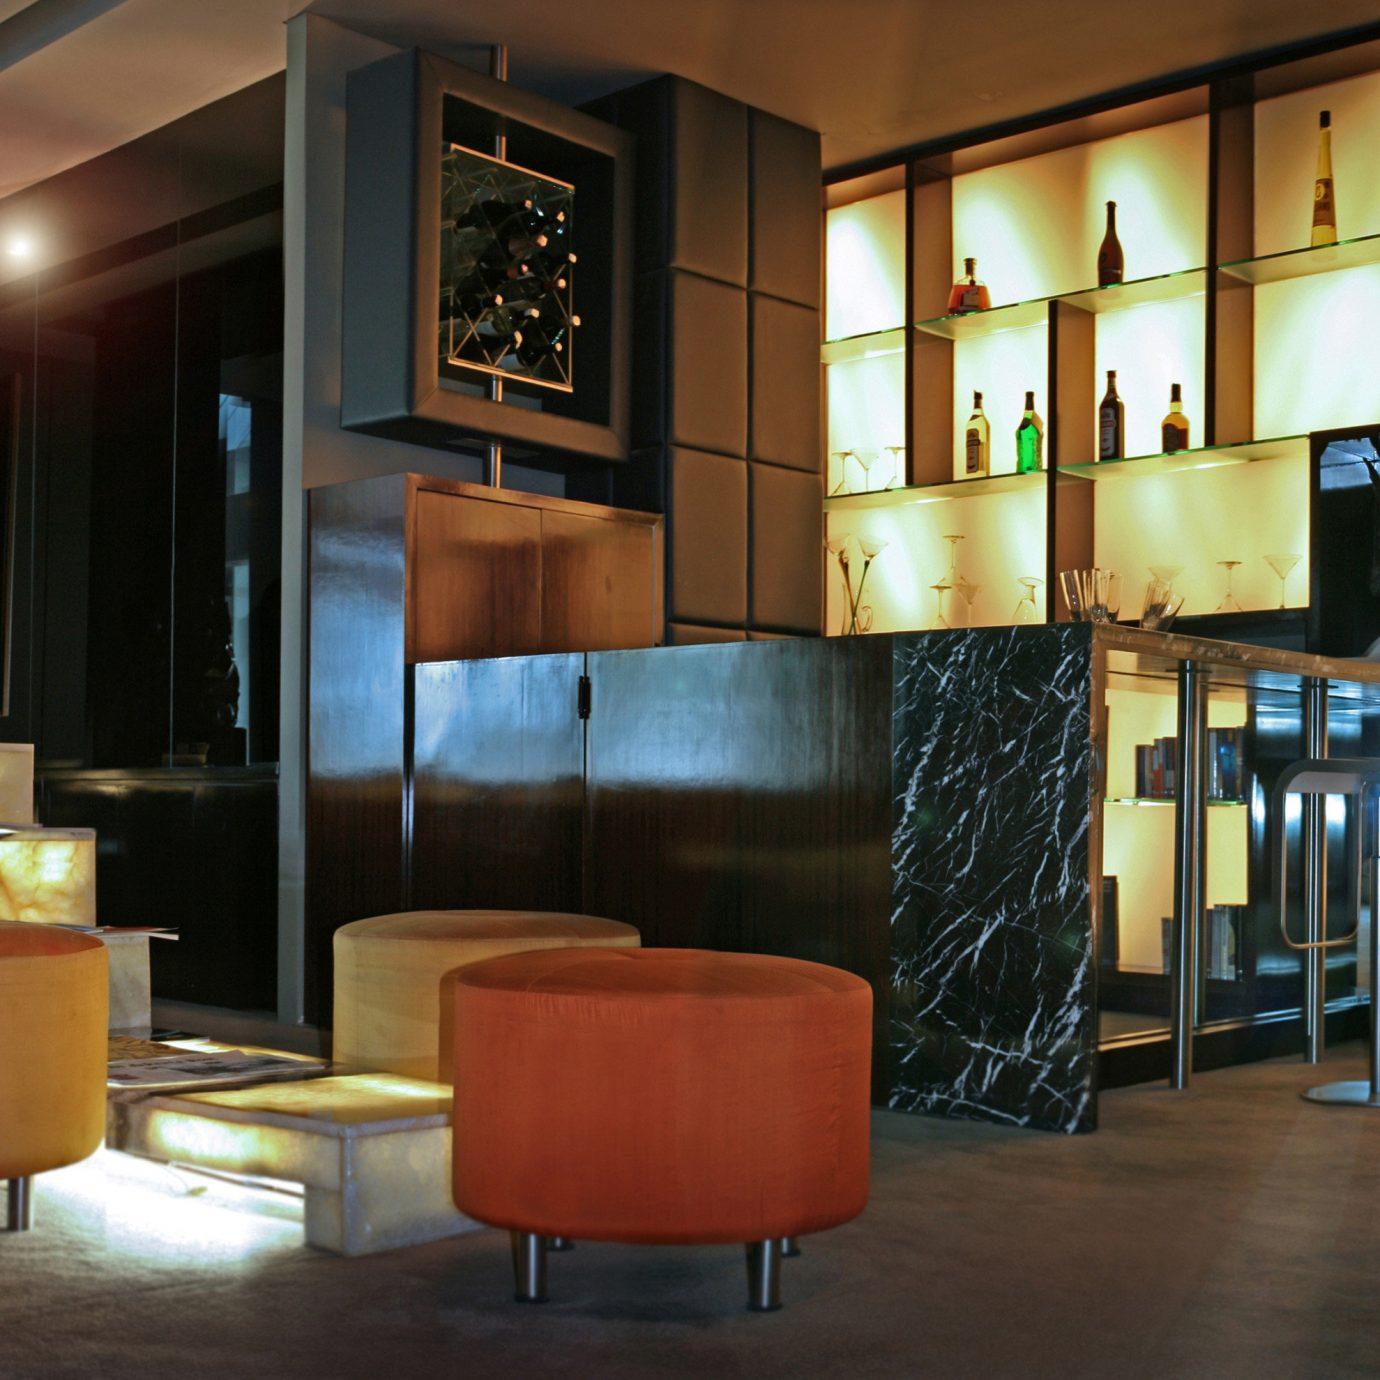 Architecture City Lobby Lounge Modern orange restaurant living room Bar